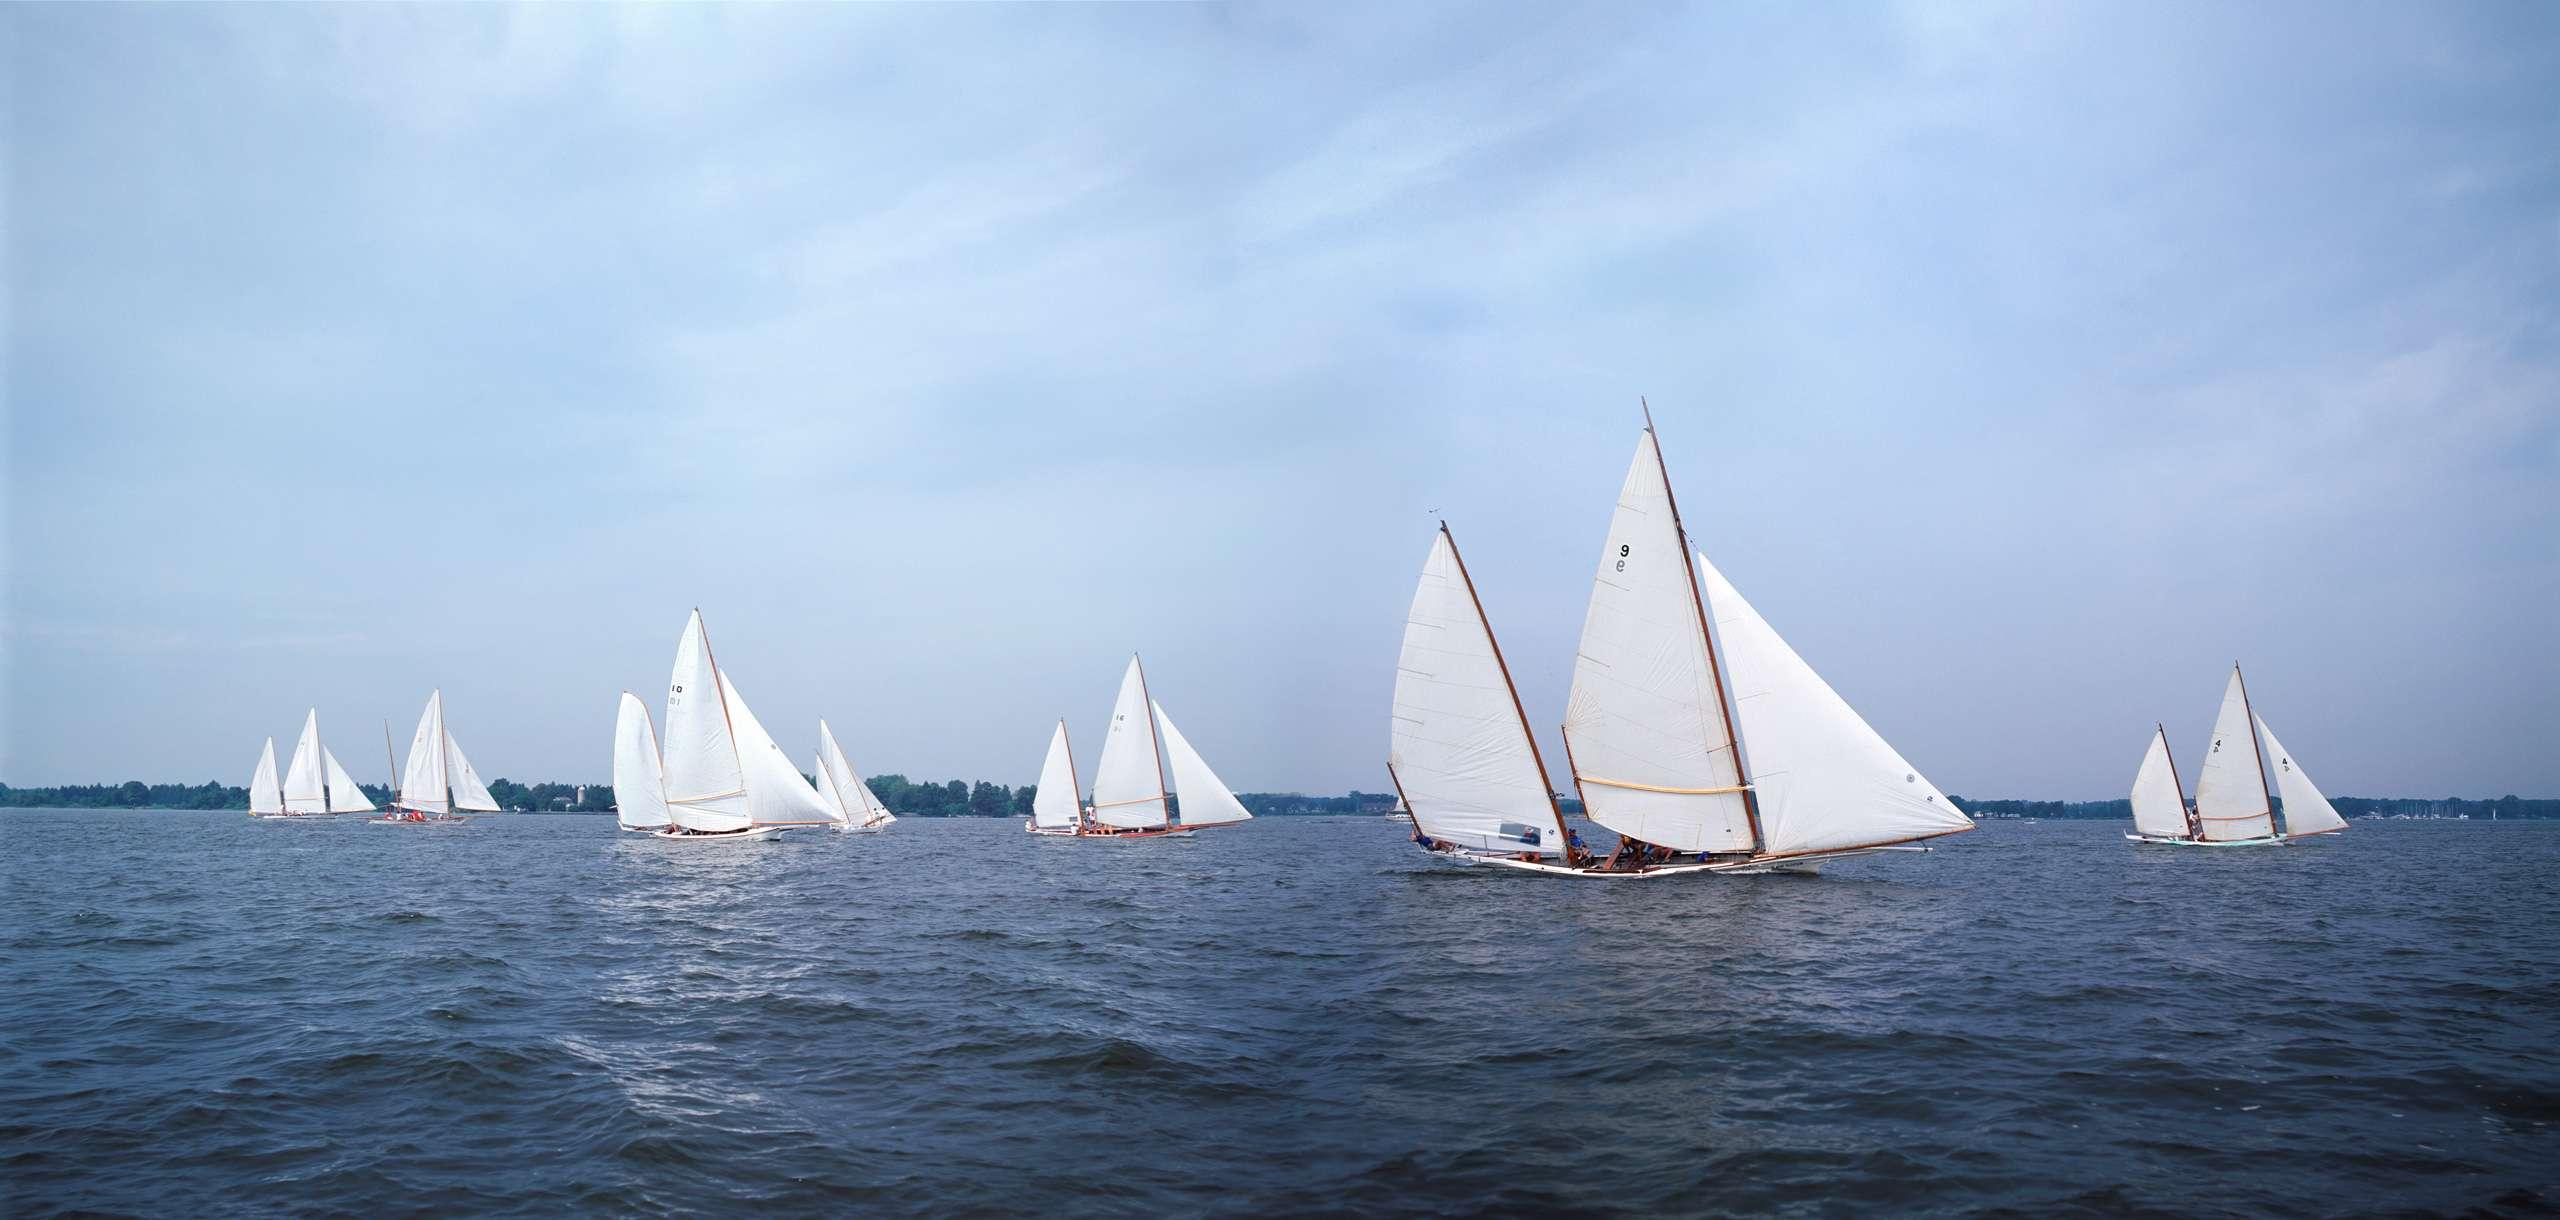 PORTFOLIO - Sailing - Chesapeake #16     PCG255